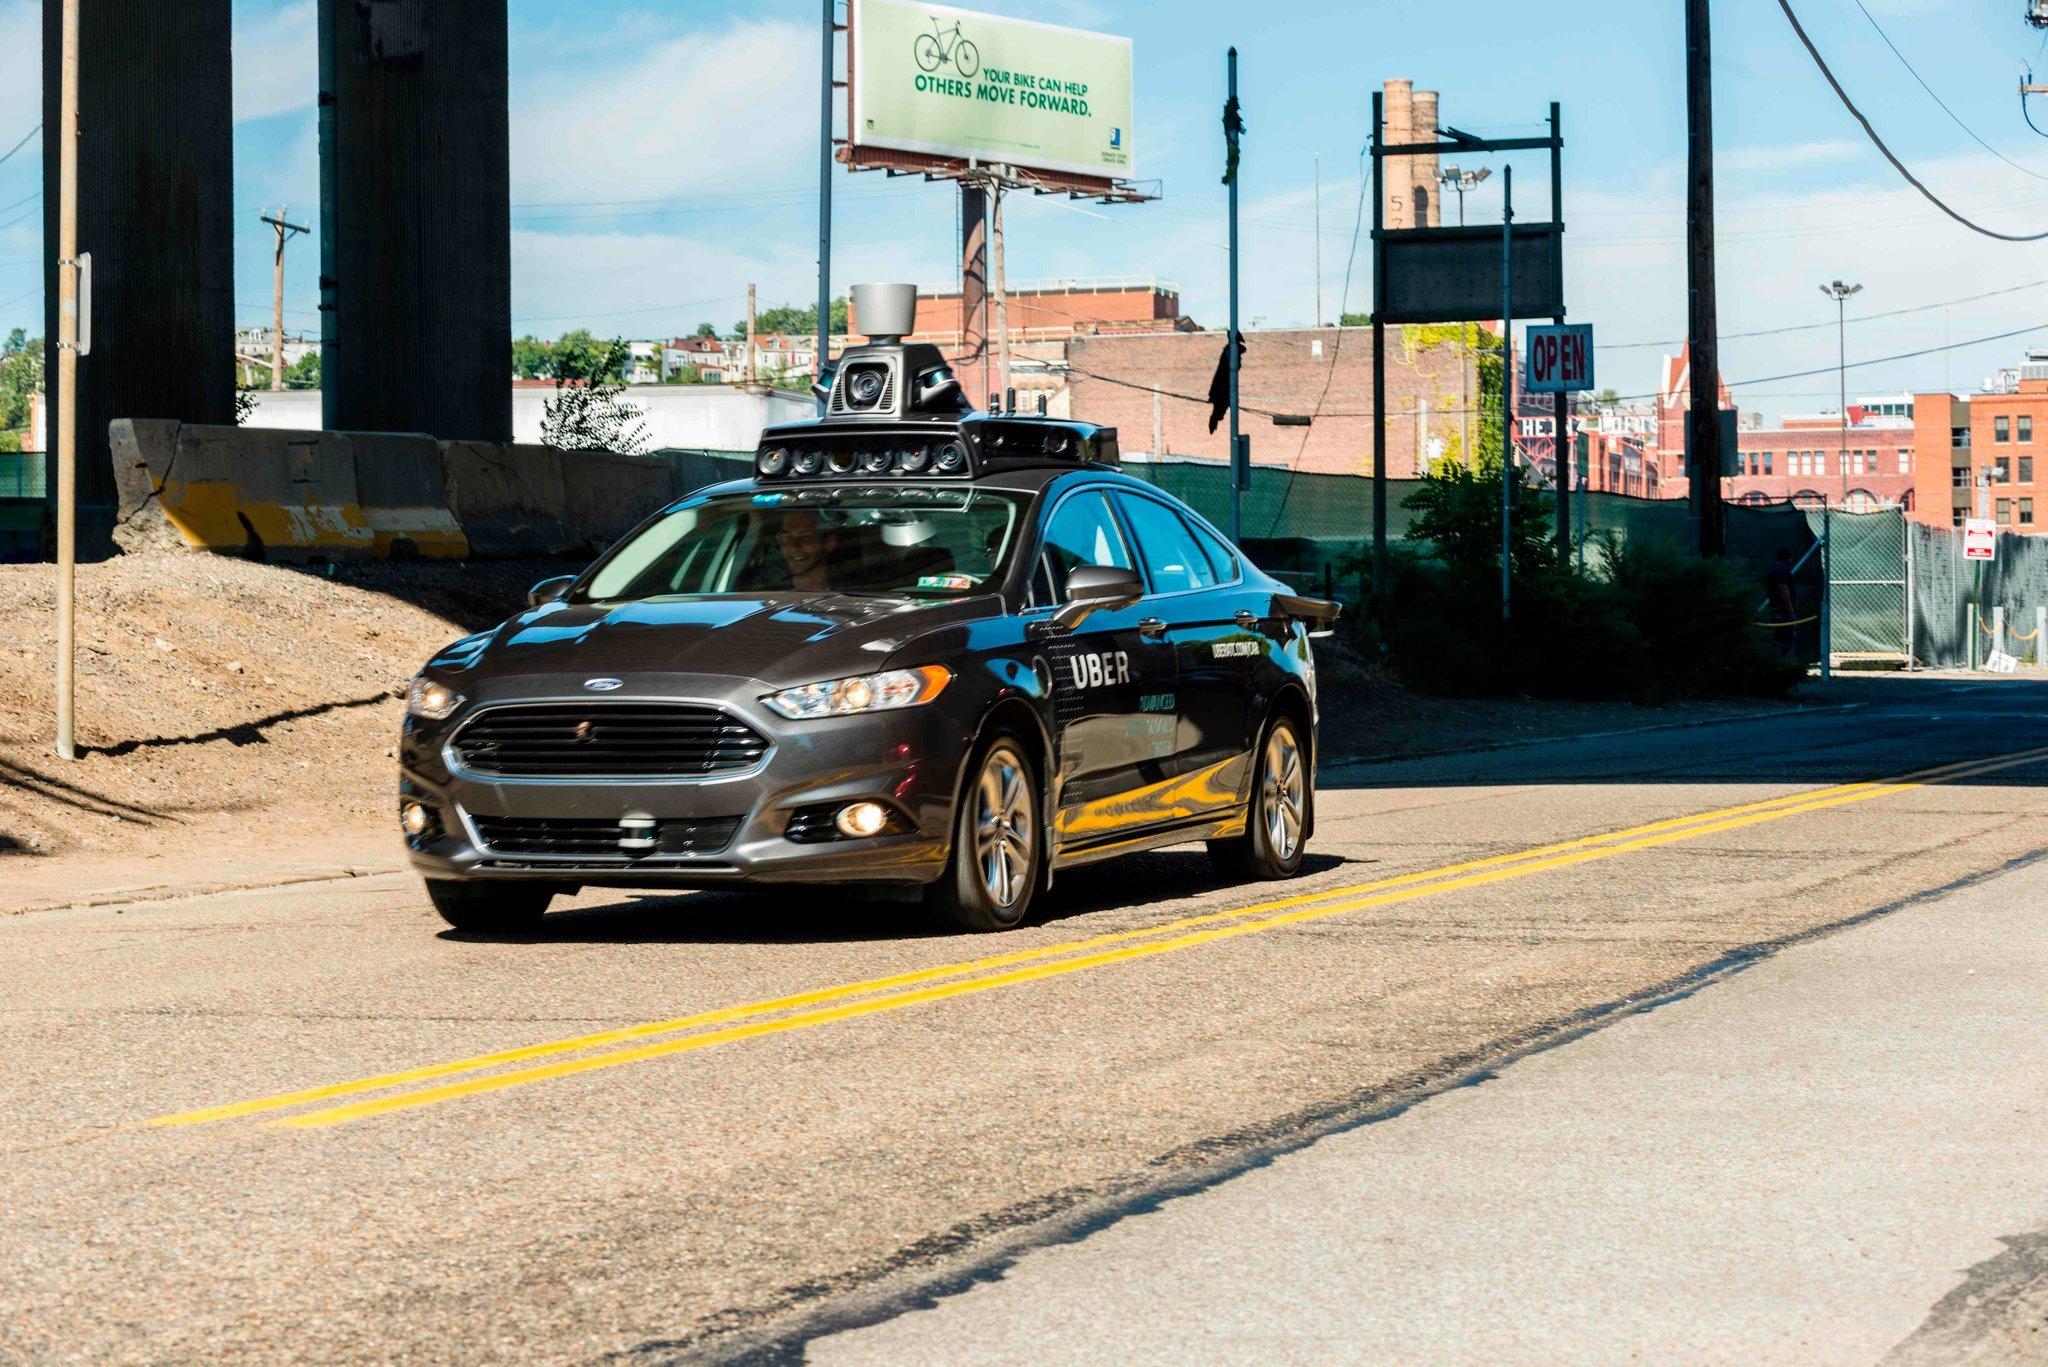 Uber即将恢复无人驾驶测试:规模缩小 车速减慢